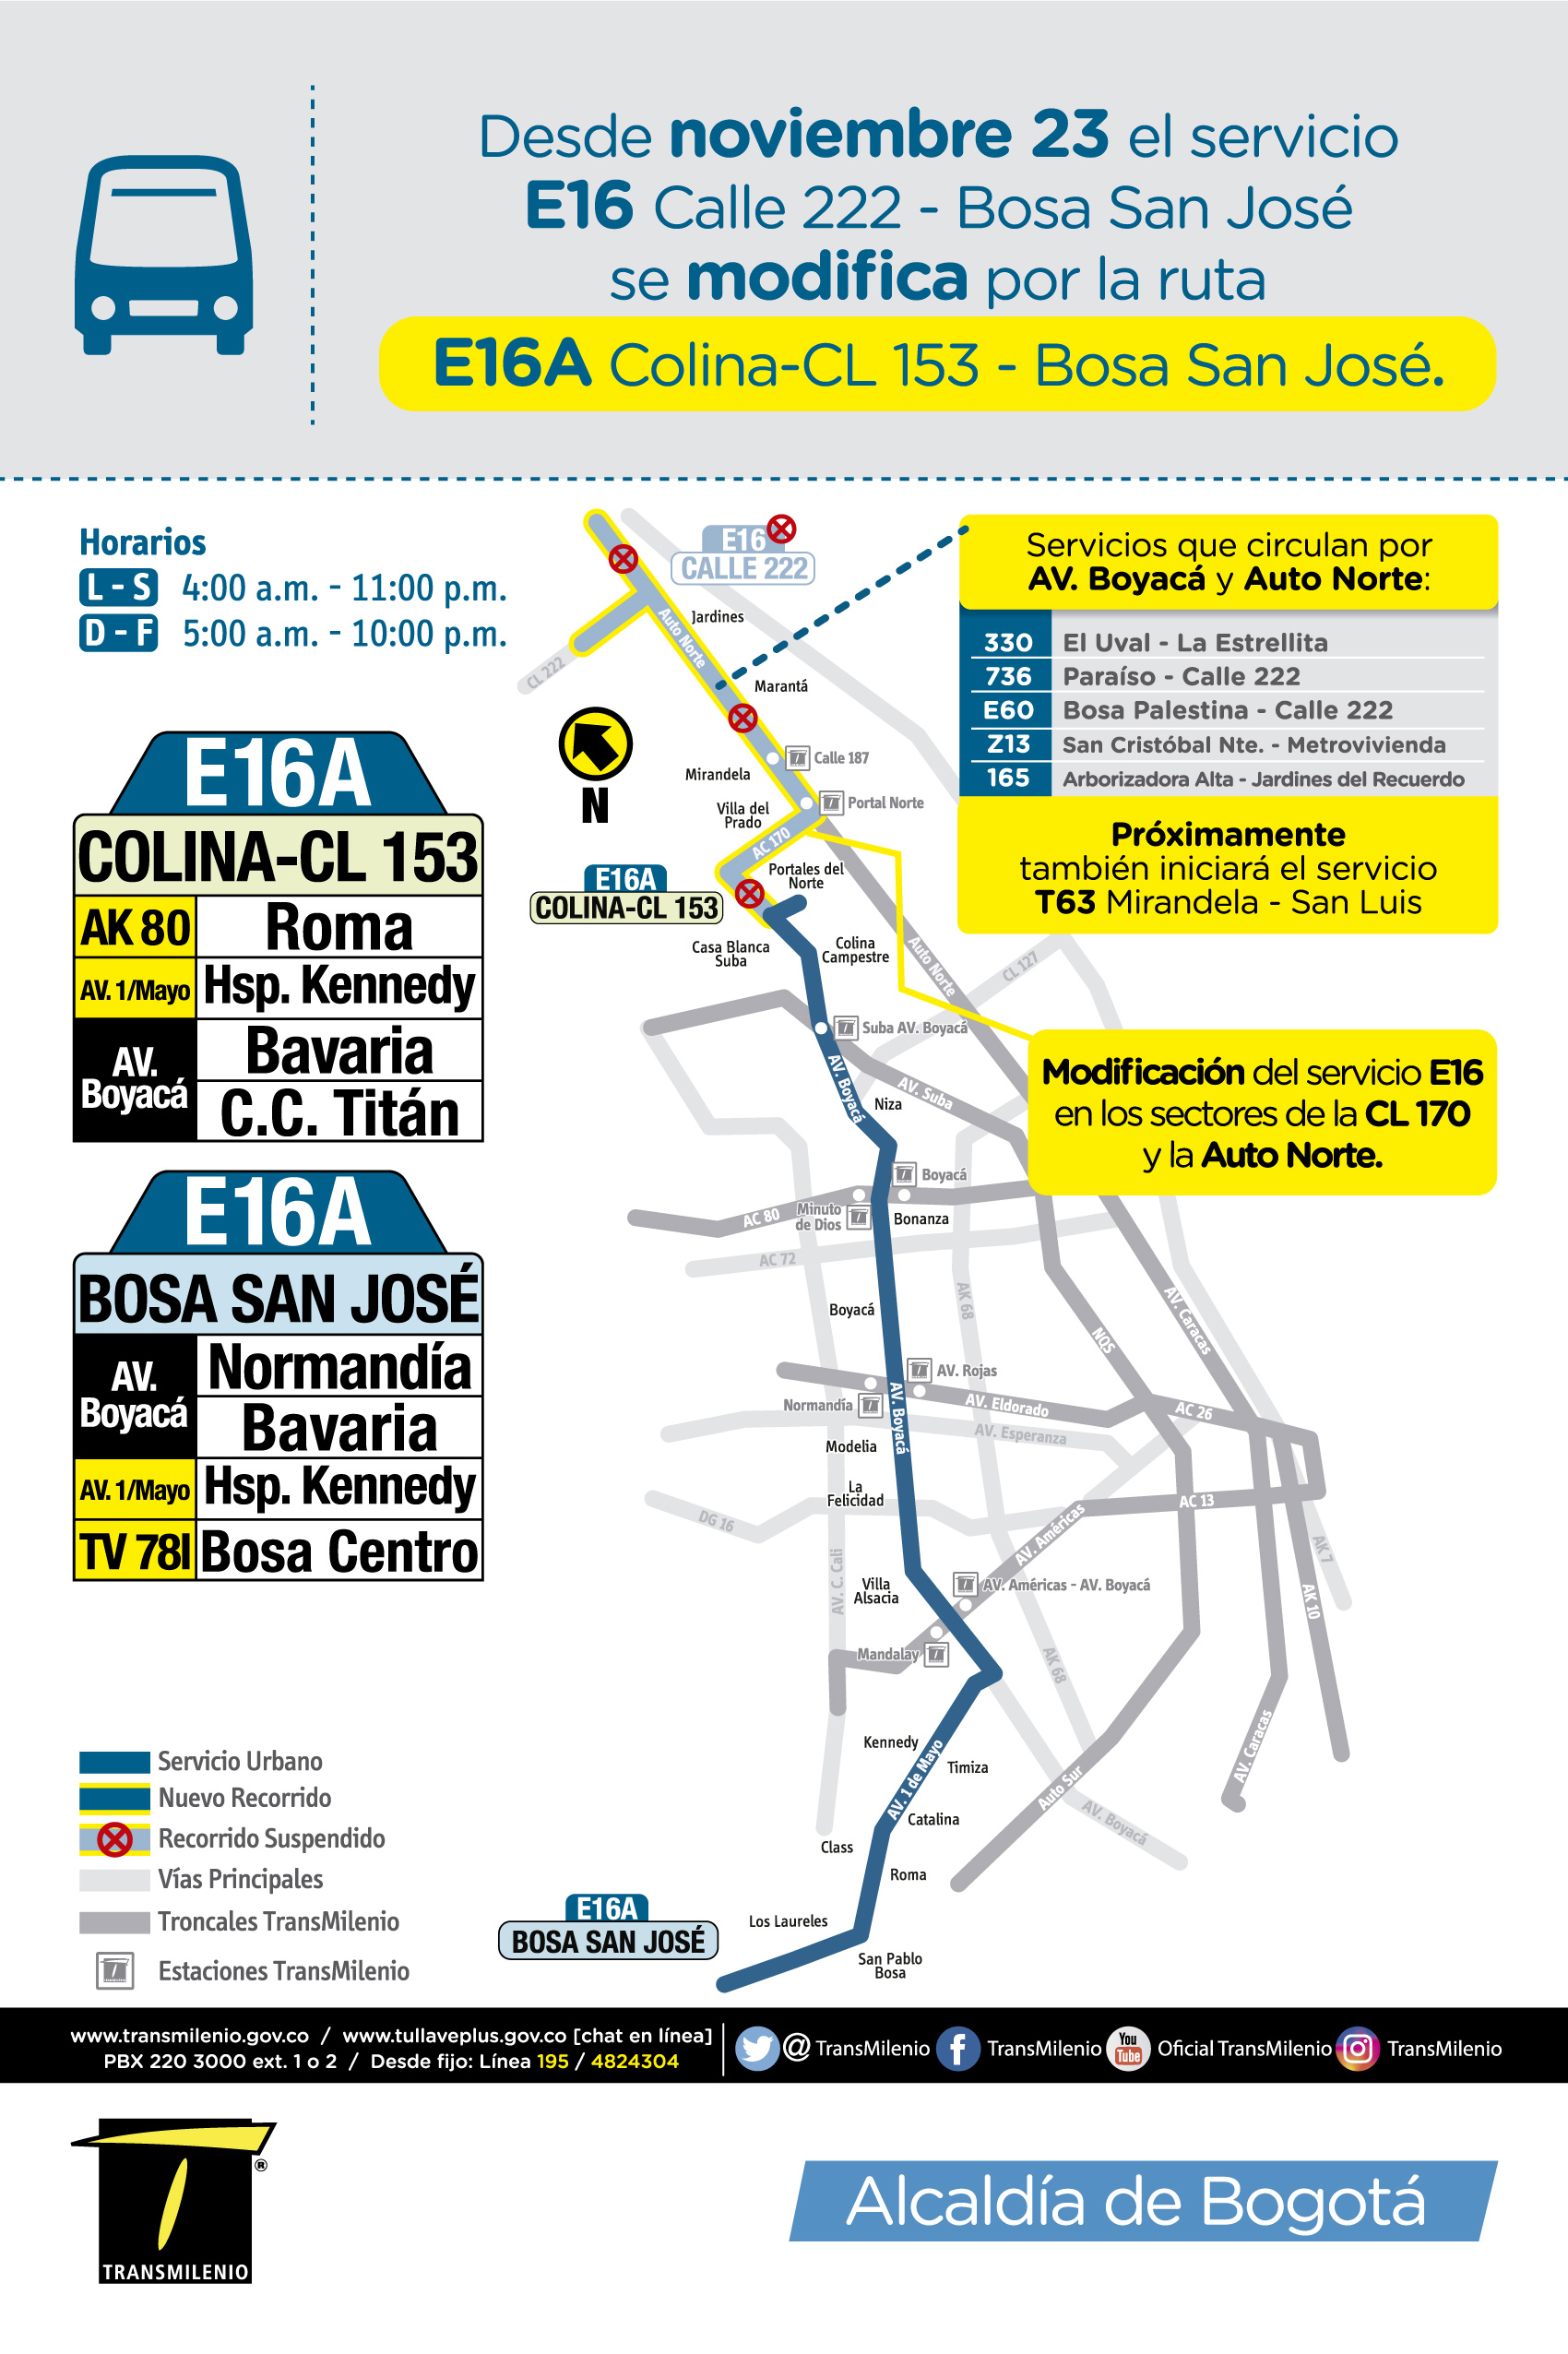 Mapa del nuevo recorrido de la ruta E16